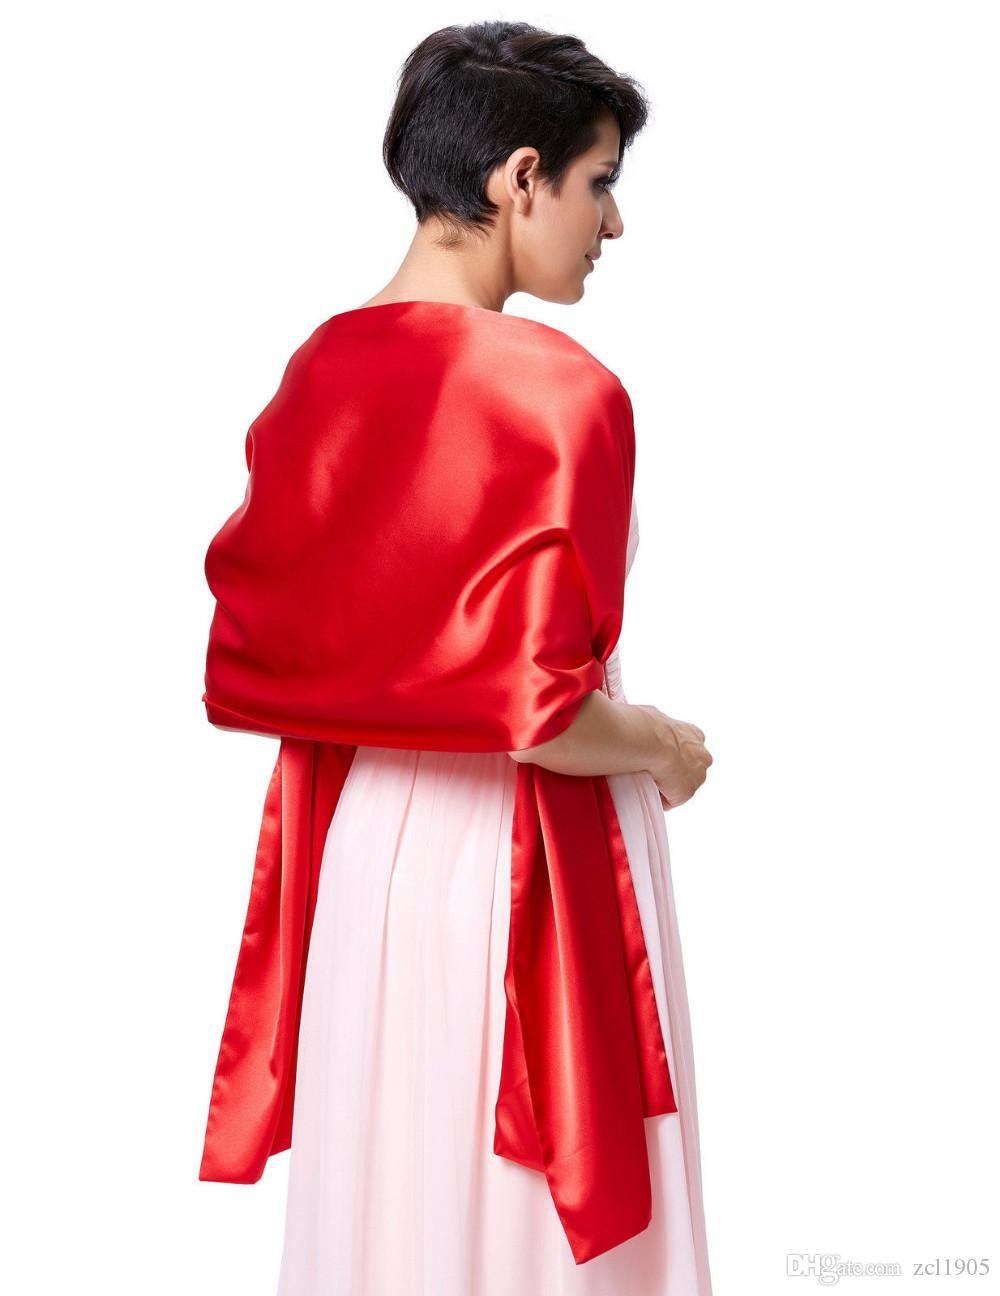 Fashion Classic Bridal Wraps 2016 Black Red Purple Champagne White Wedding Shawl Wedding Accessories Bolero Bridal Jacket